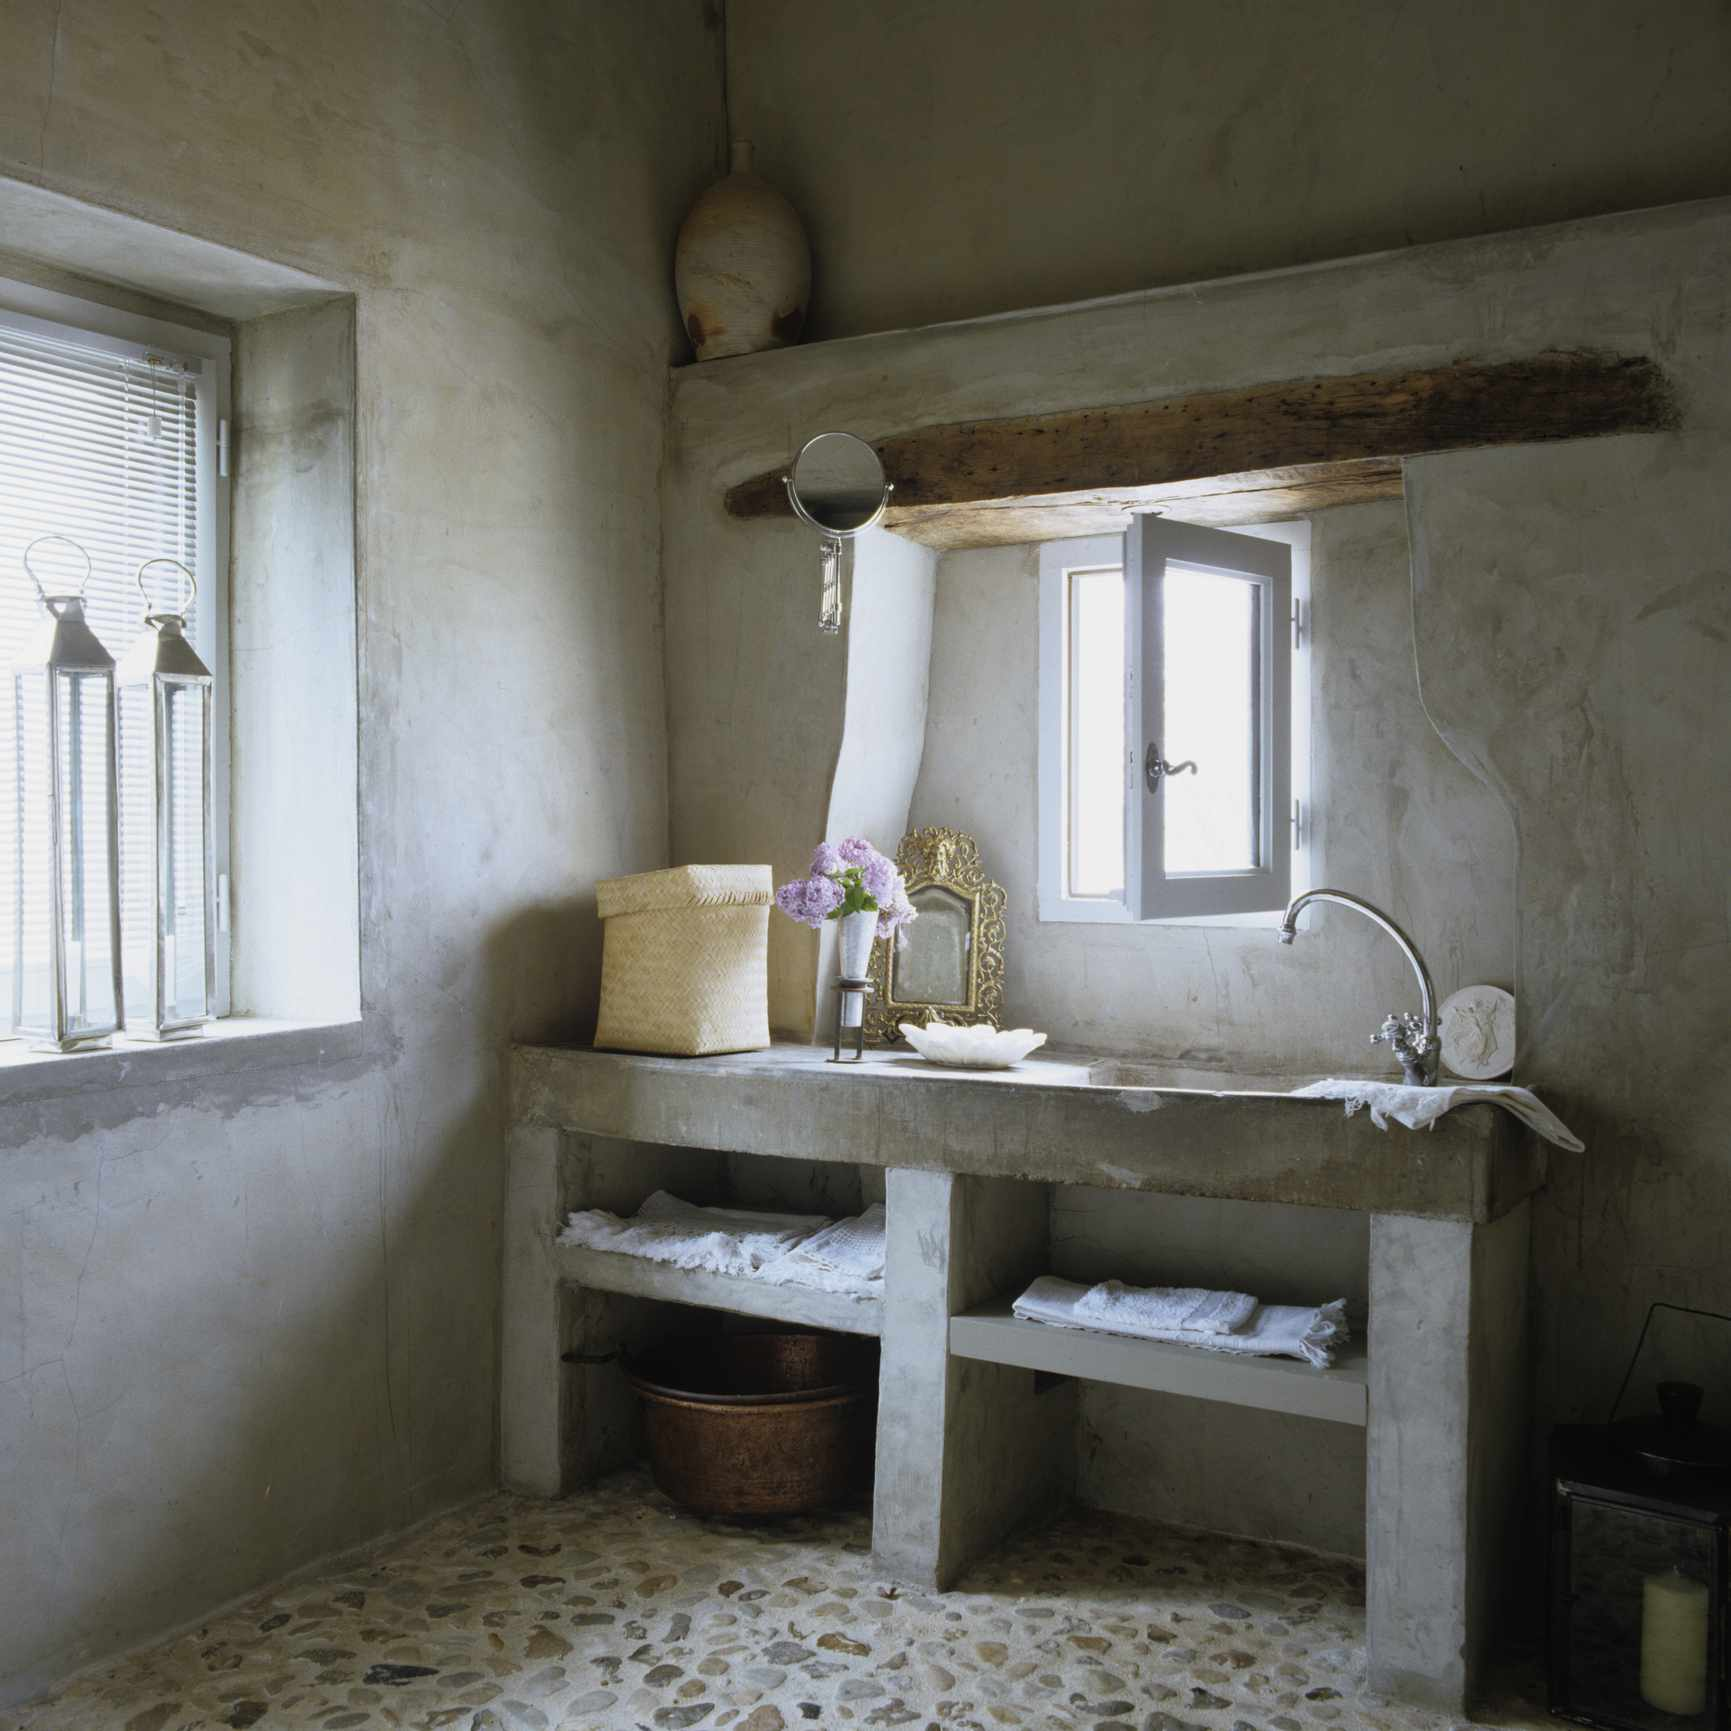 Renovated 17th century French barn bathroom